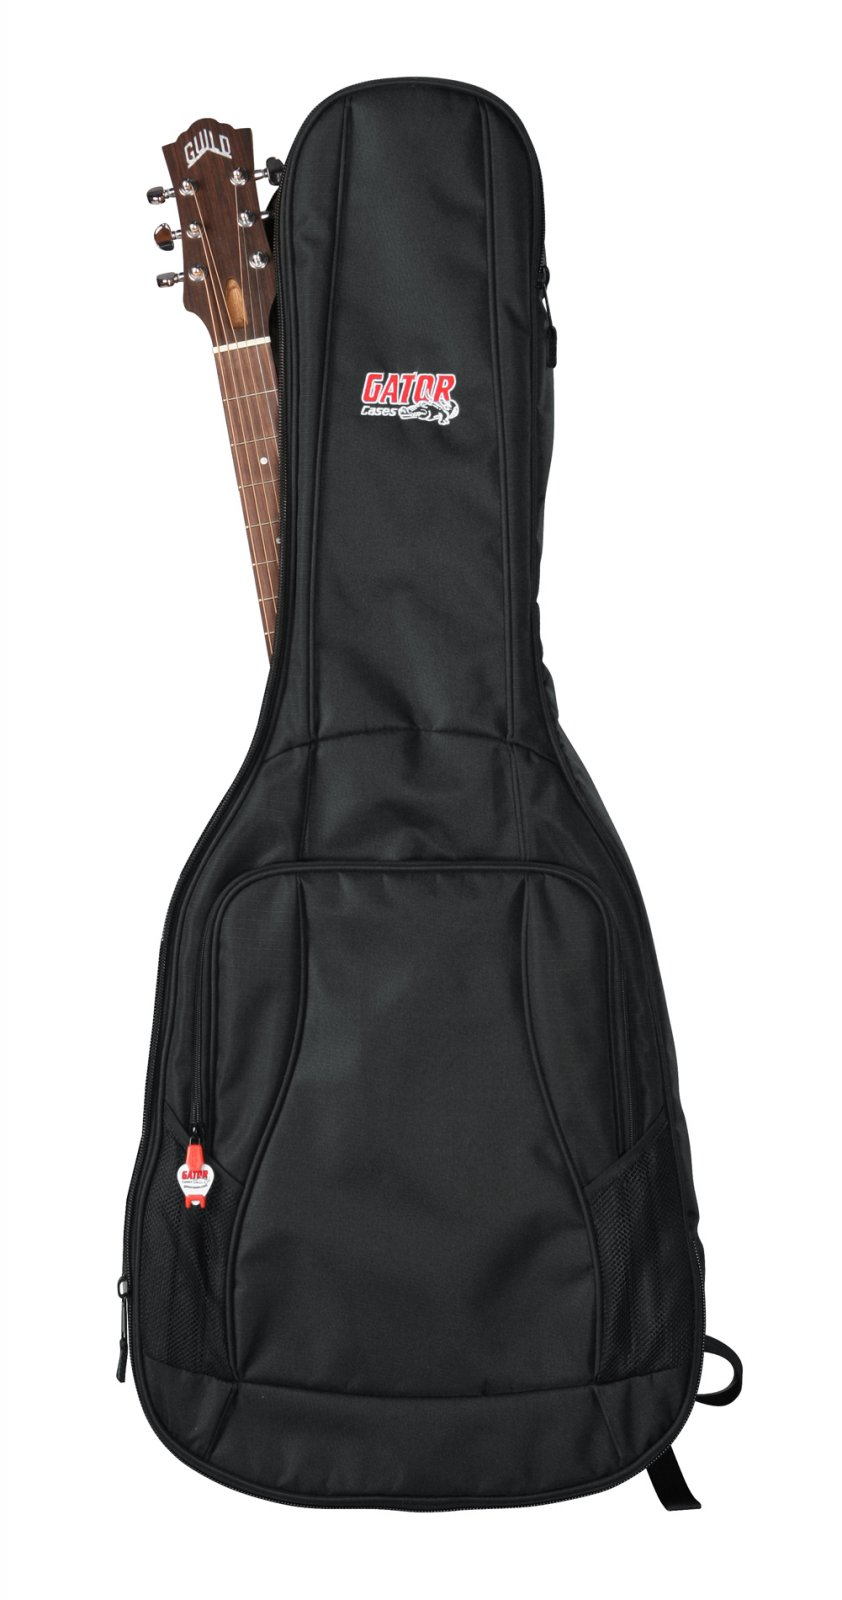 Gator 4G Acoustic Gig Bag